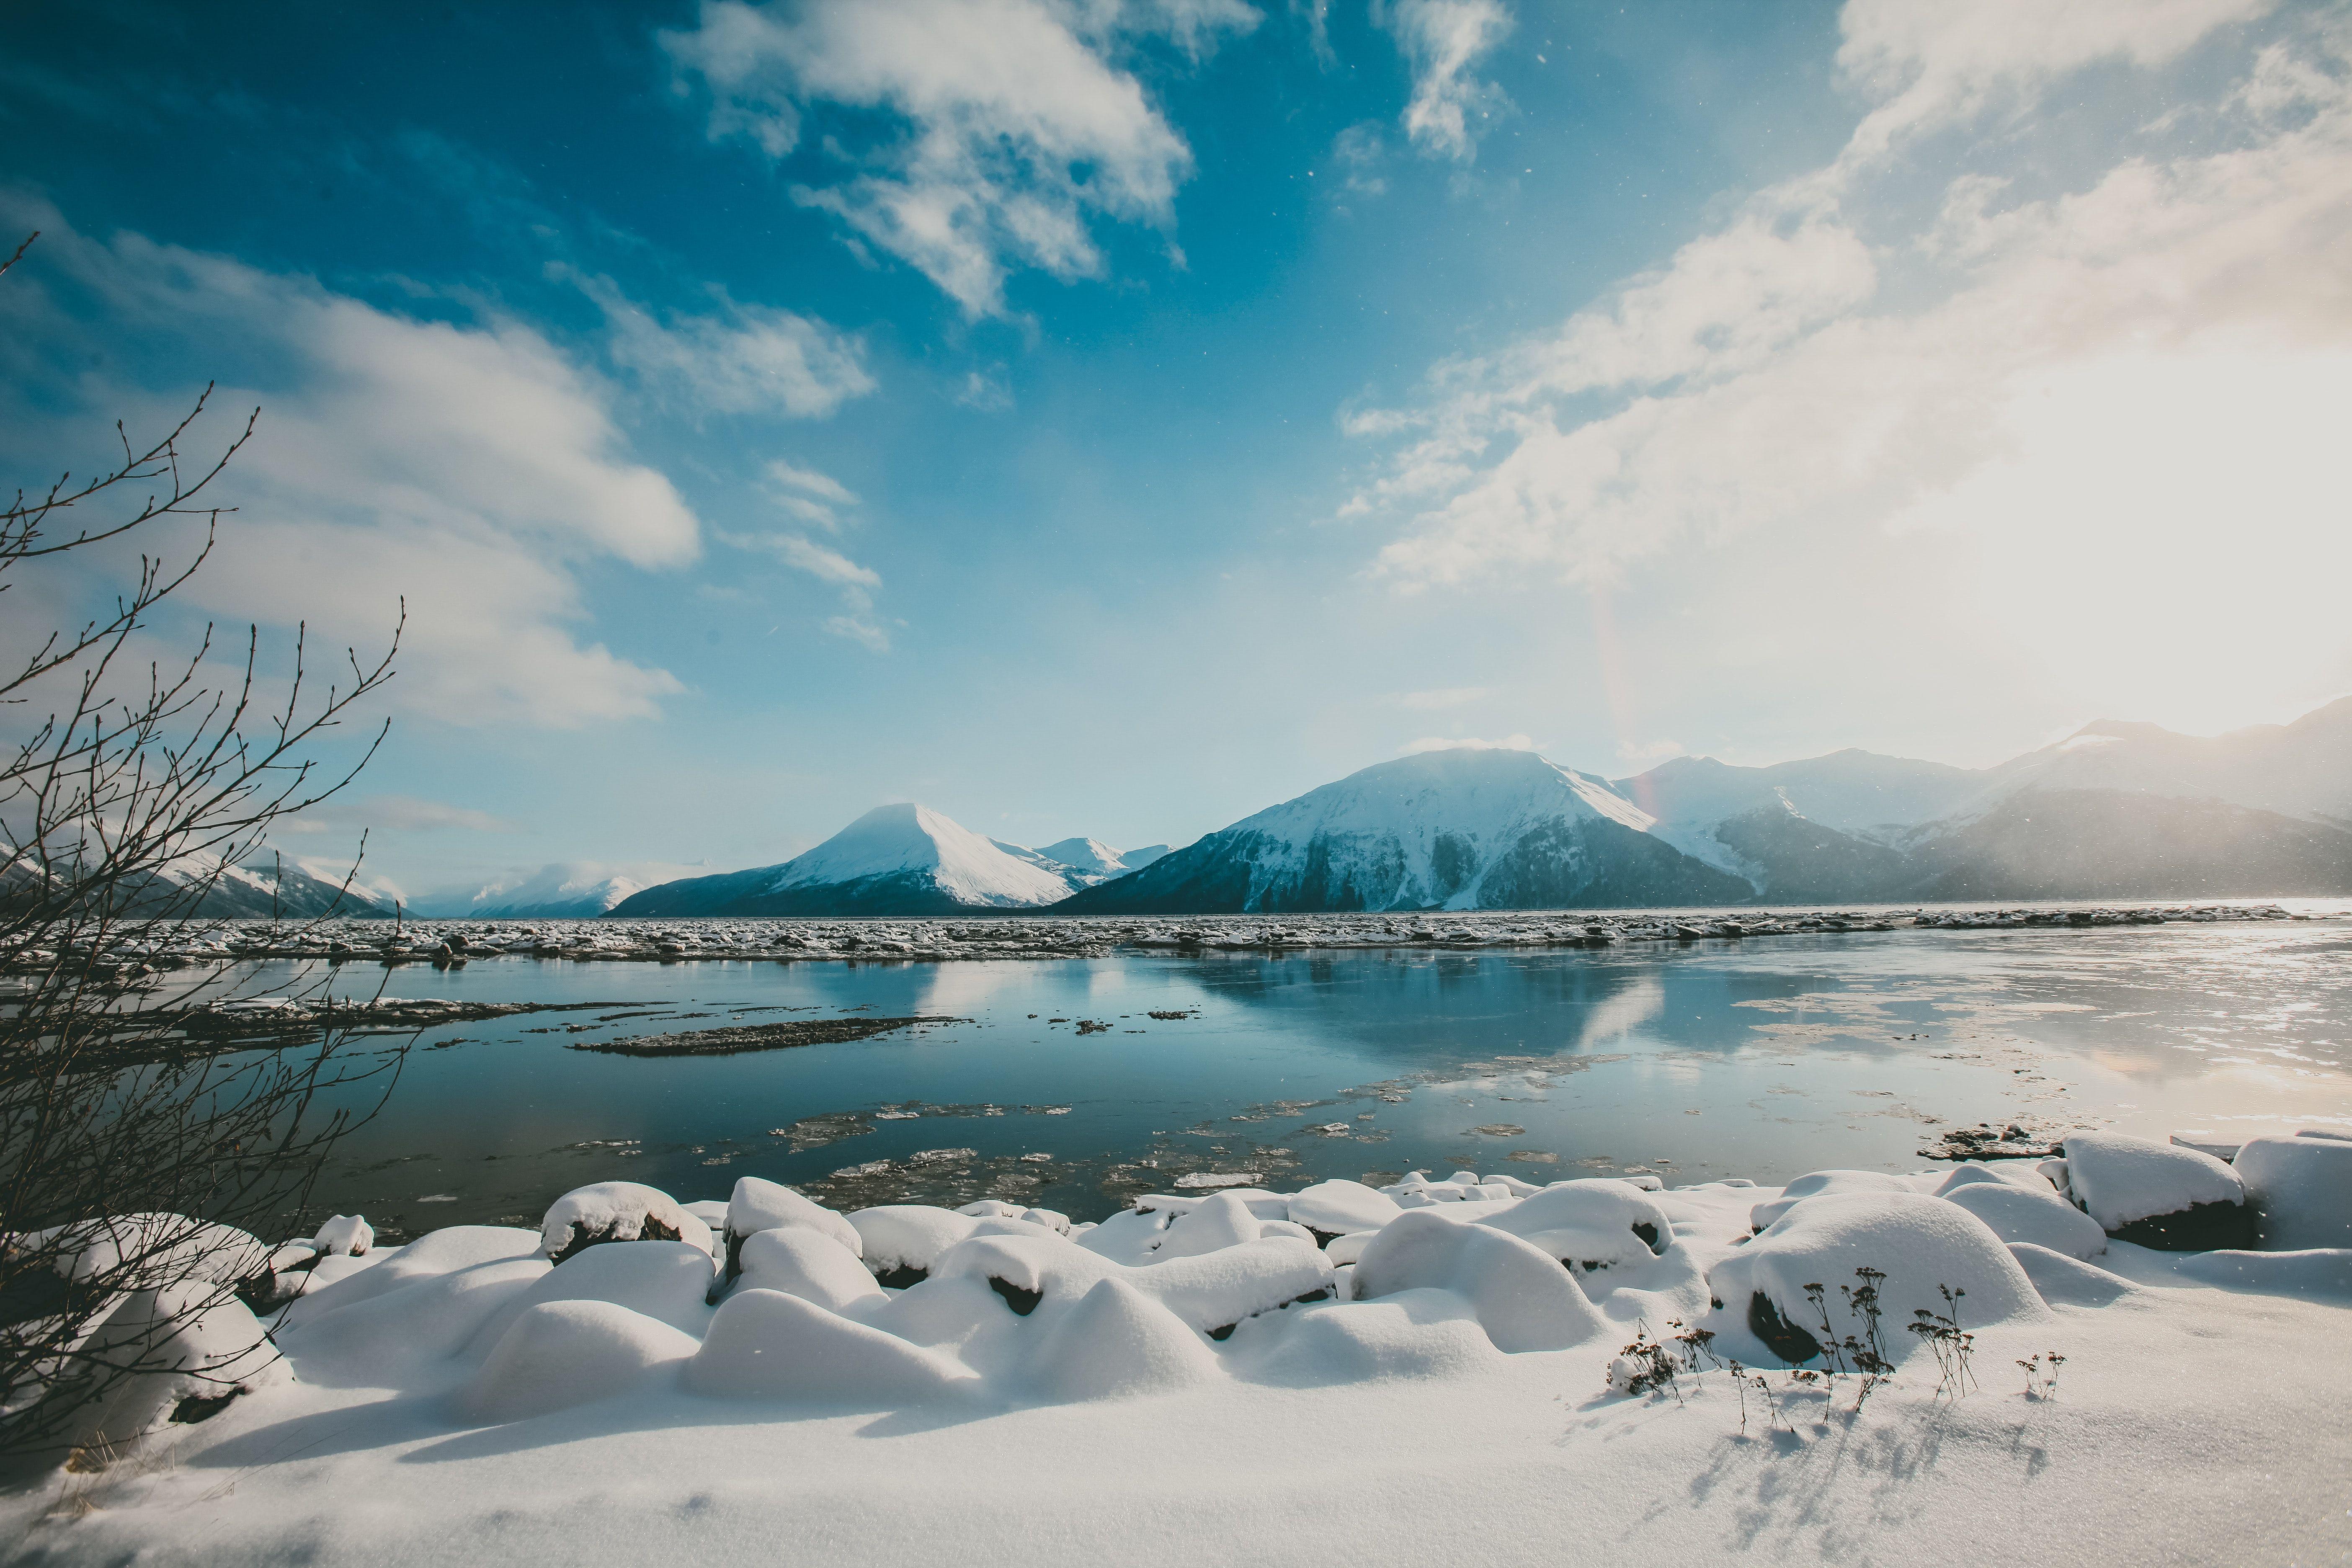 8.Alaska nonmetropolitan area